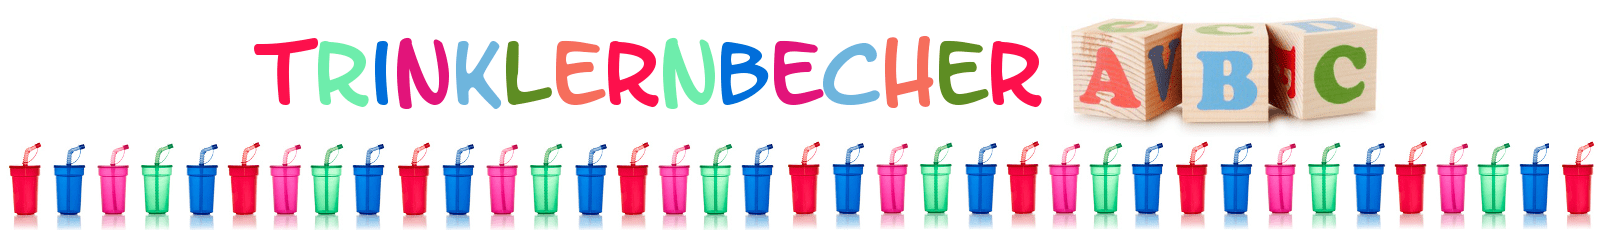 Trinklernbecher-ABC